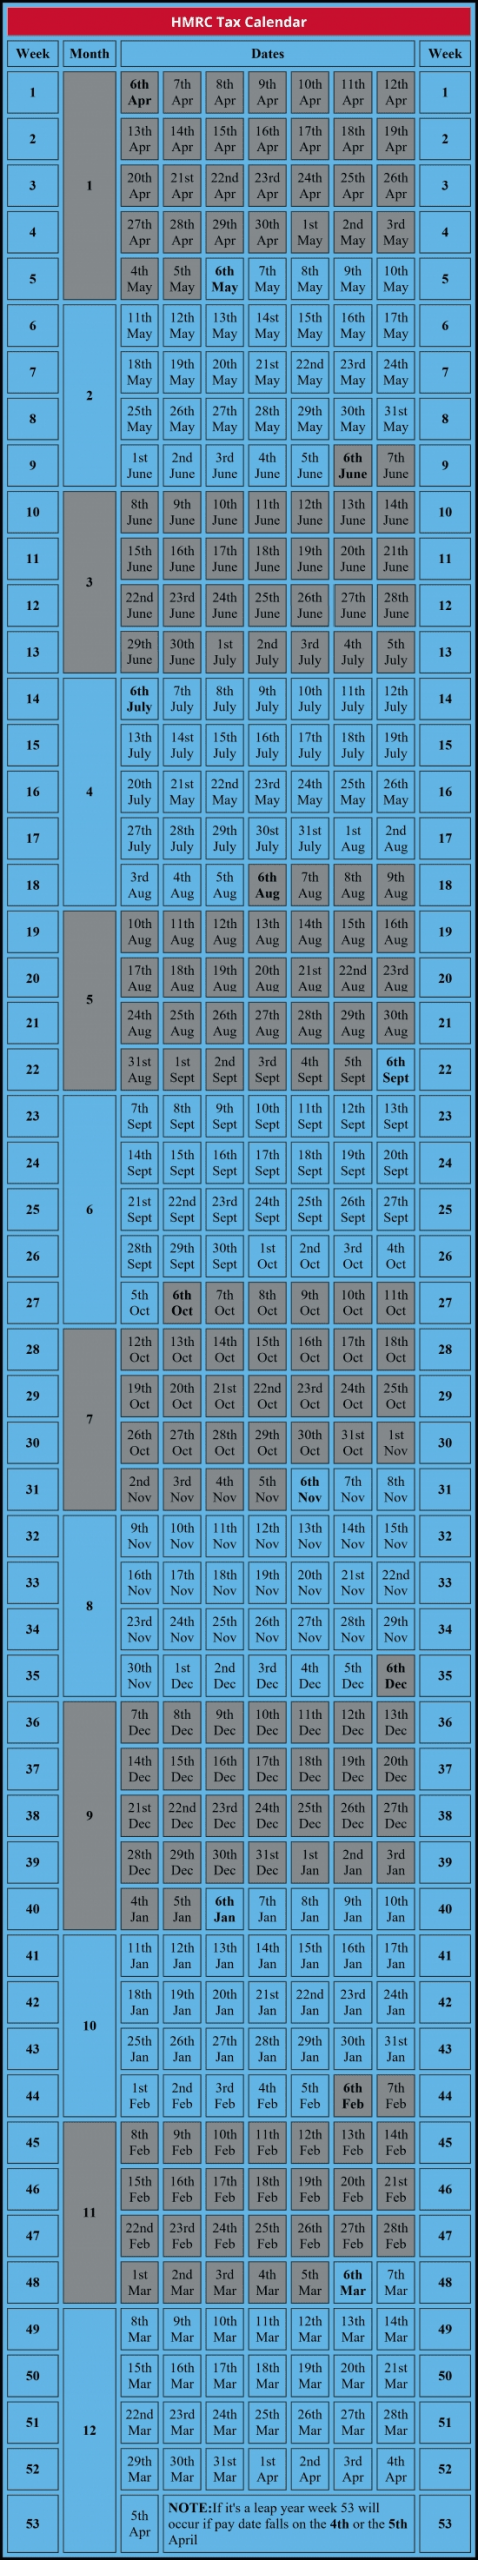 Get 22 Year Tax Calendar Hmrc